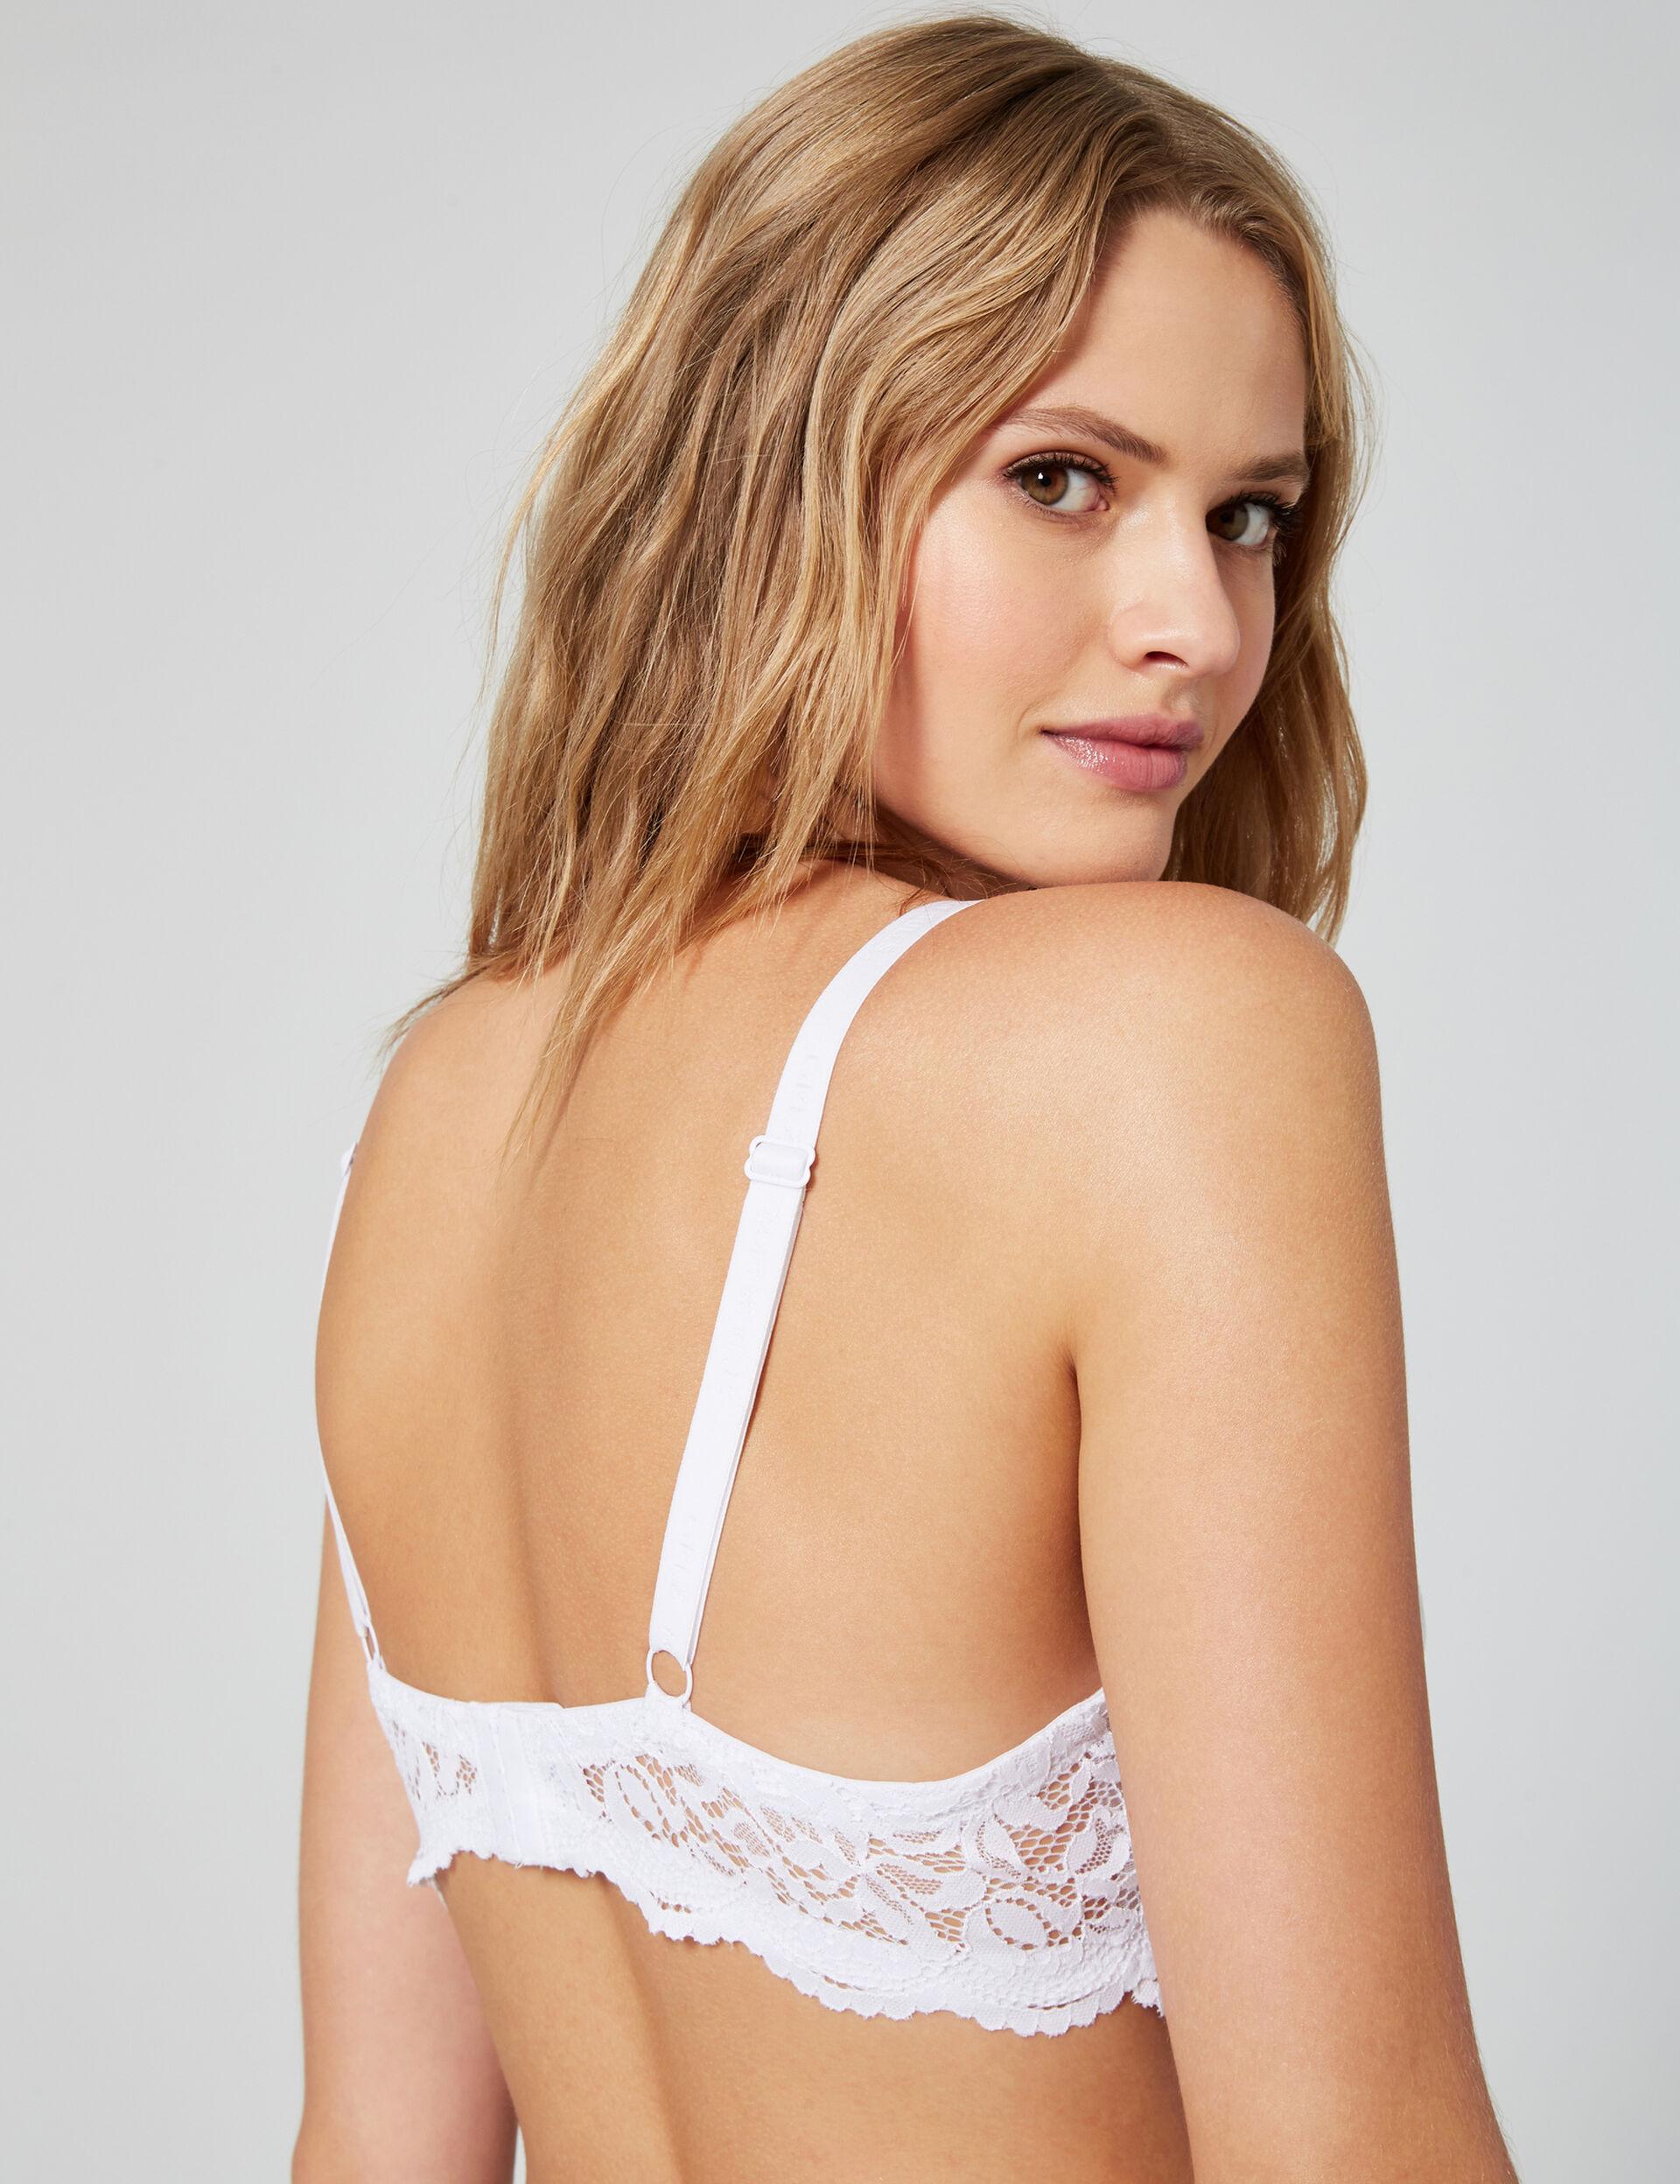 Push-up bra